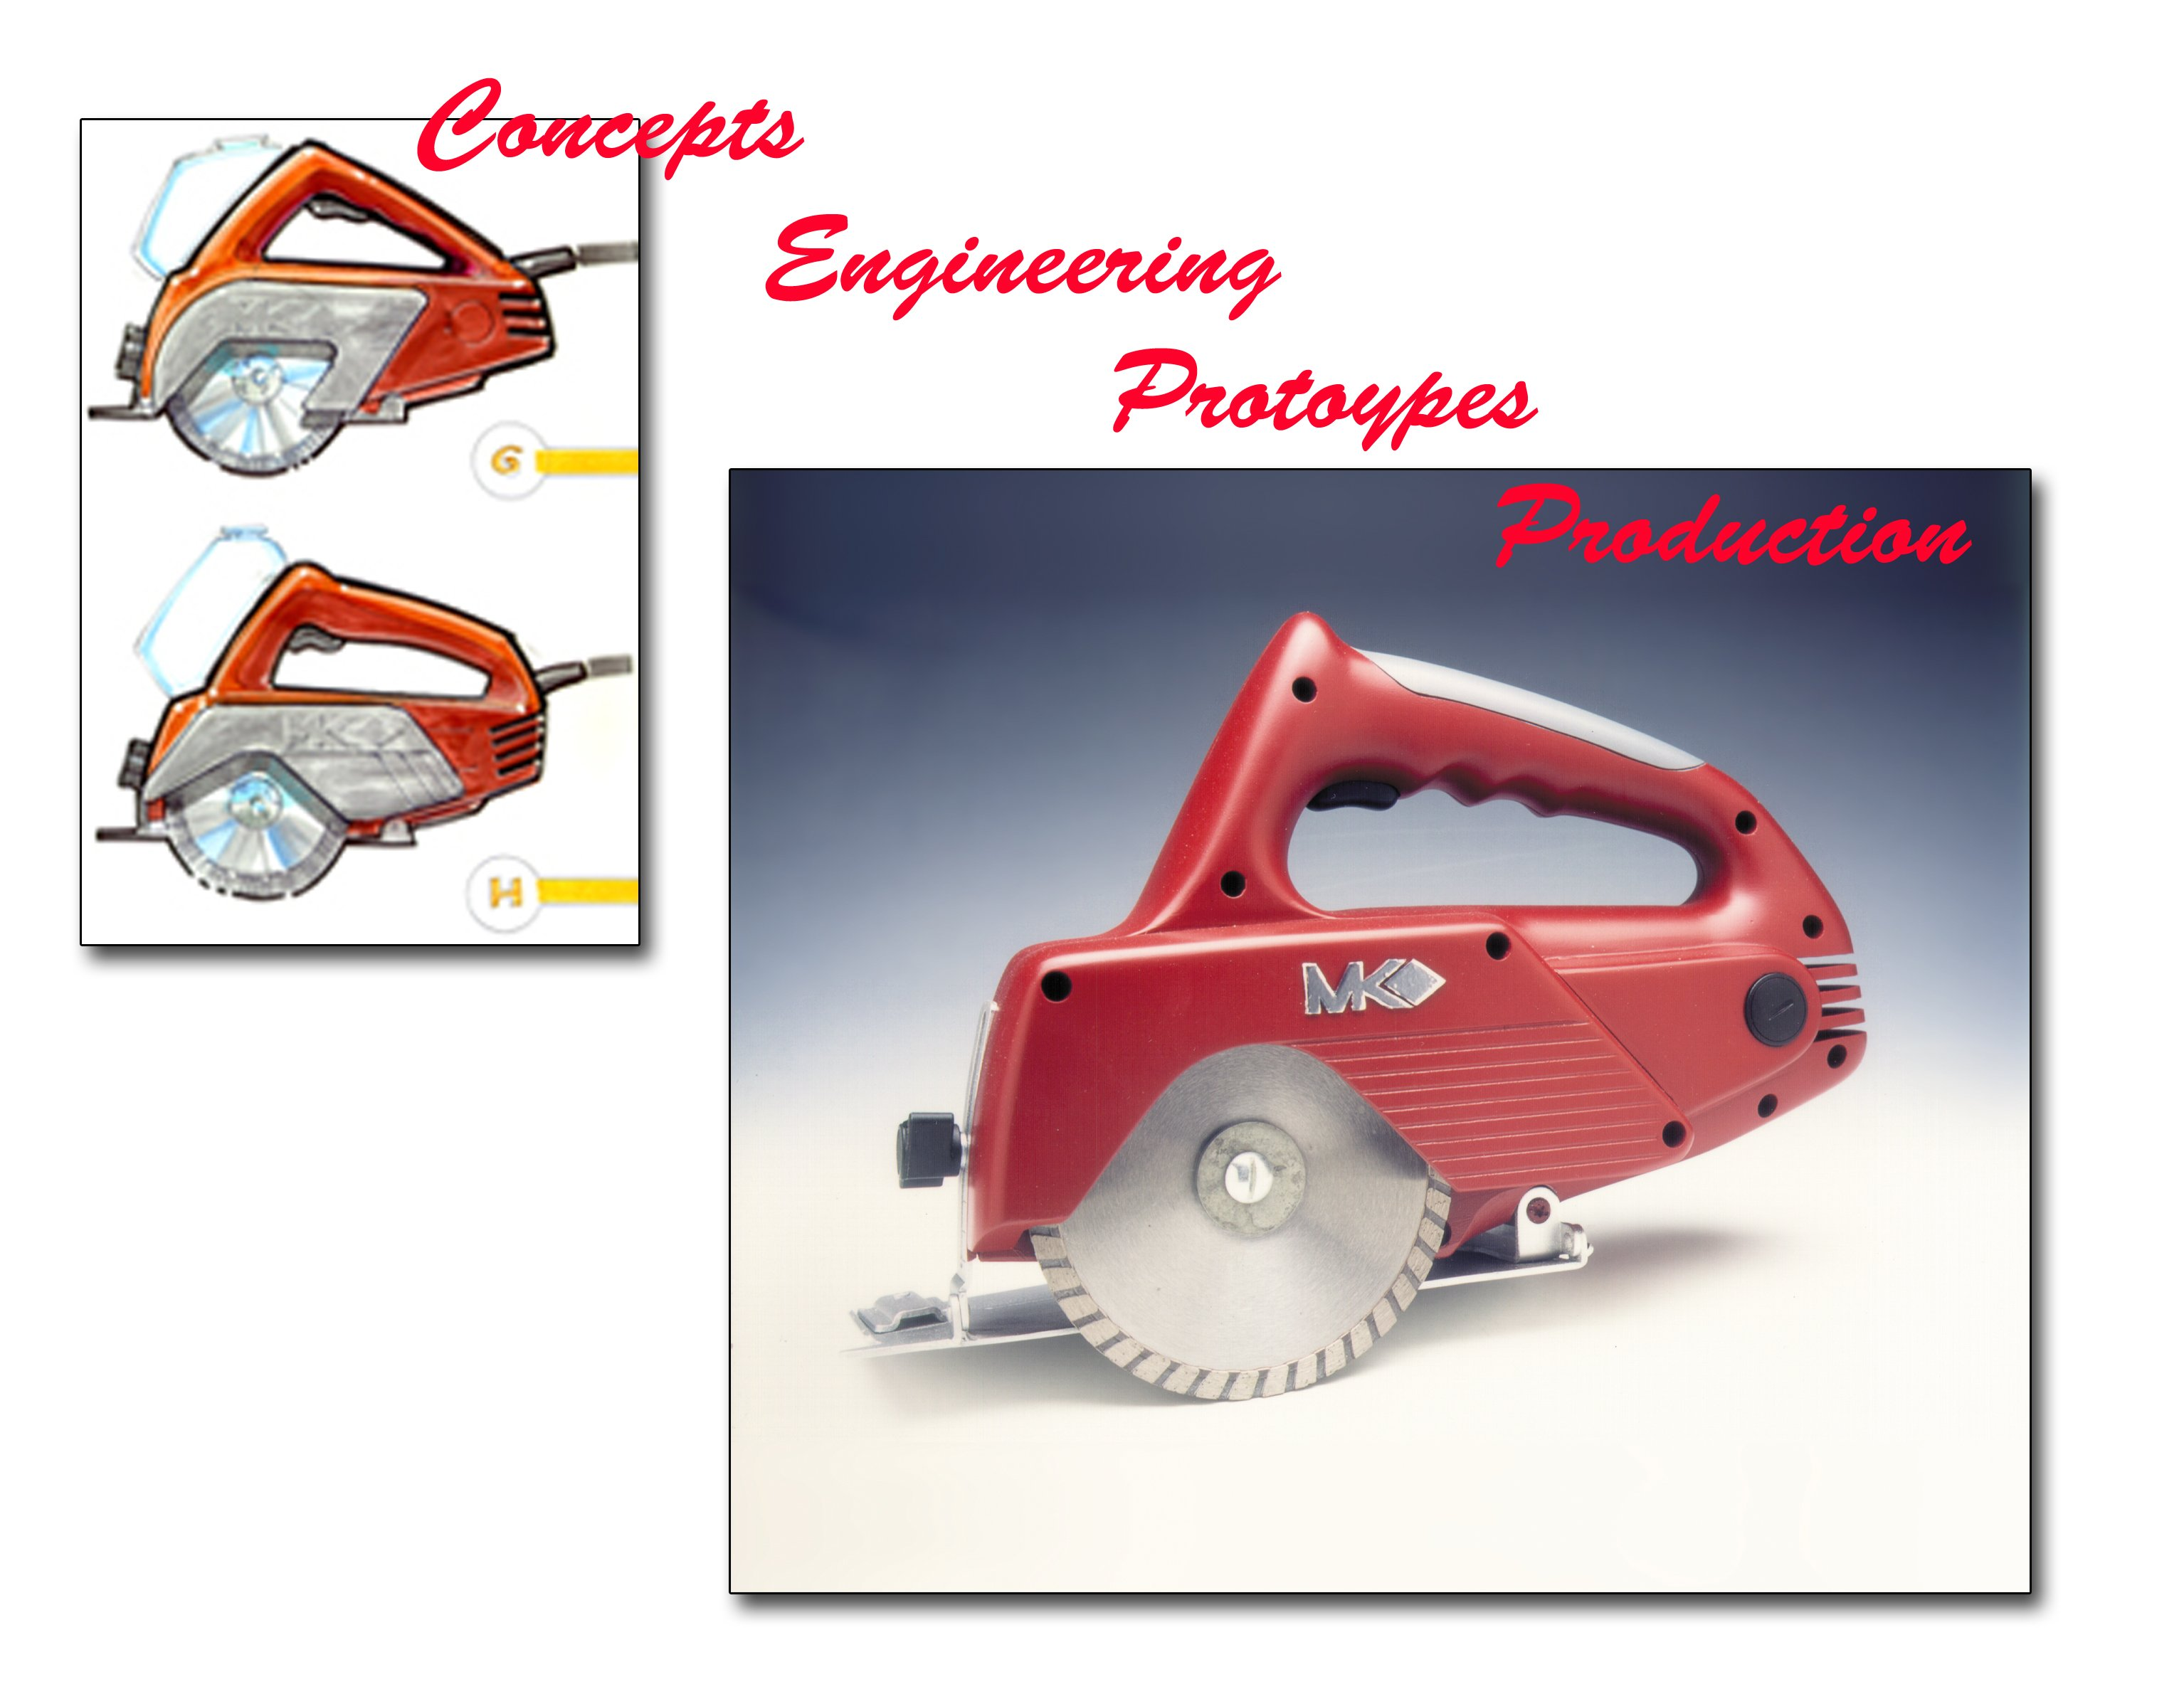 tool engineering, home depot tool design